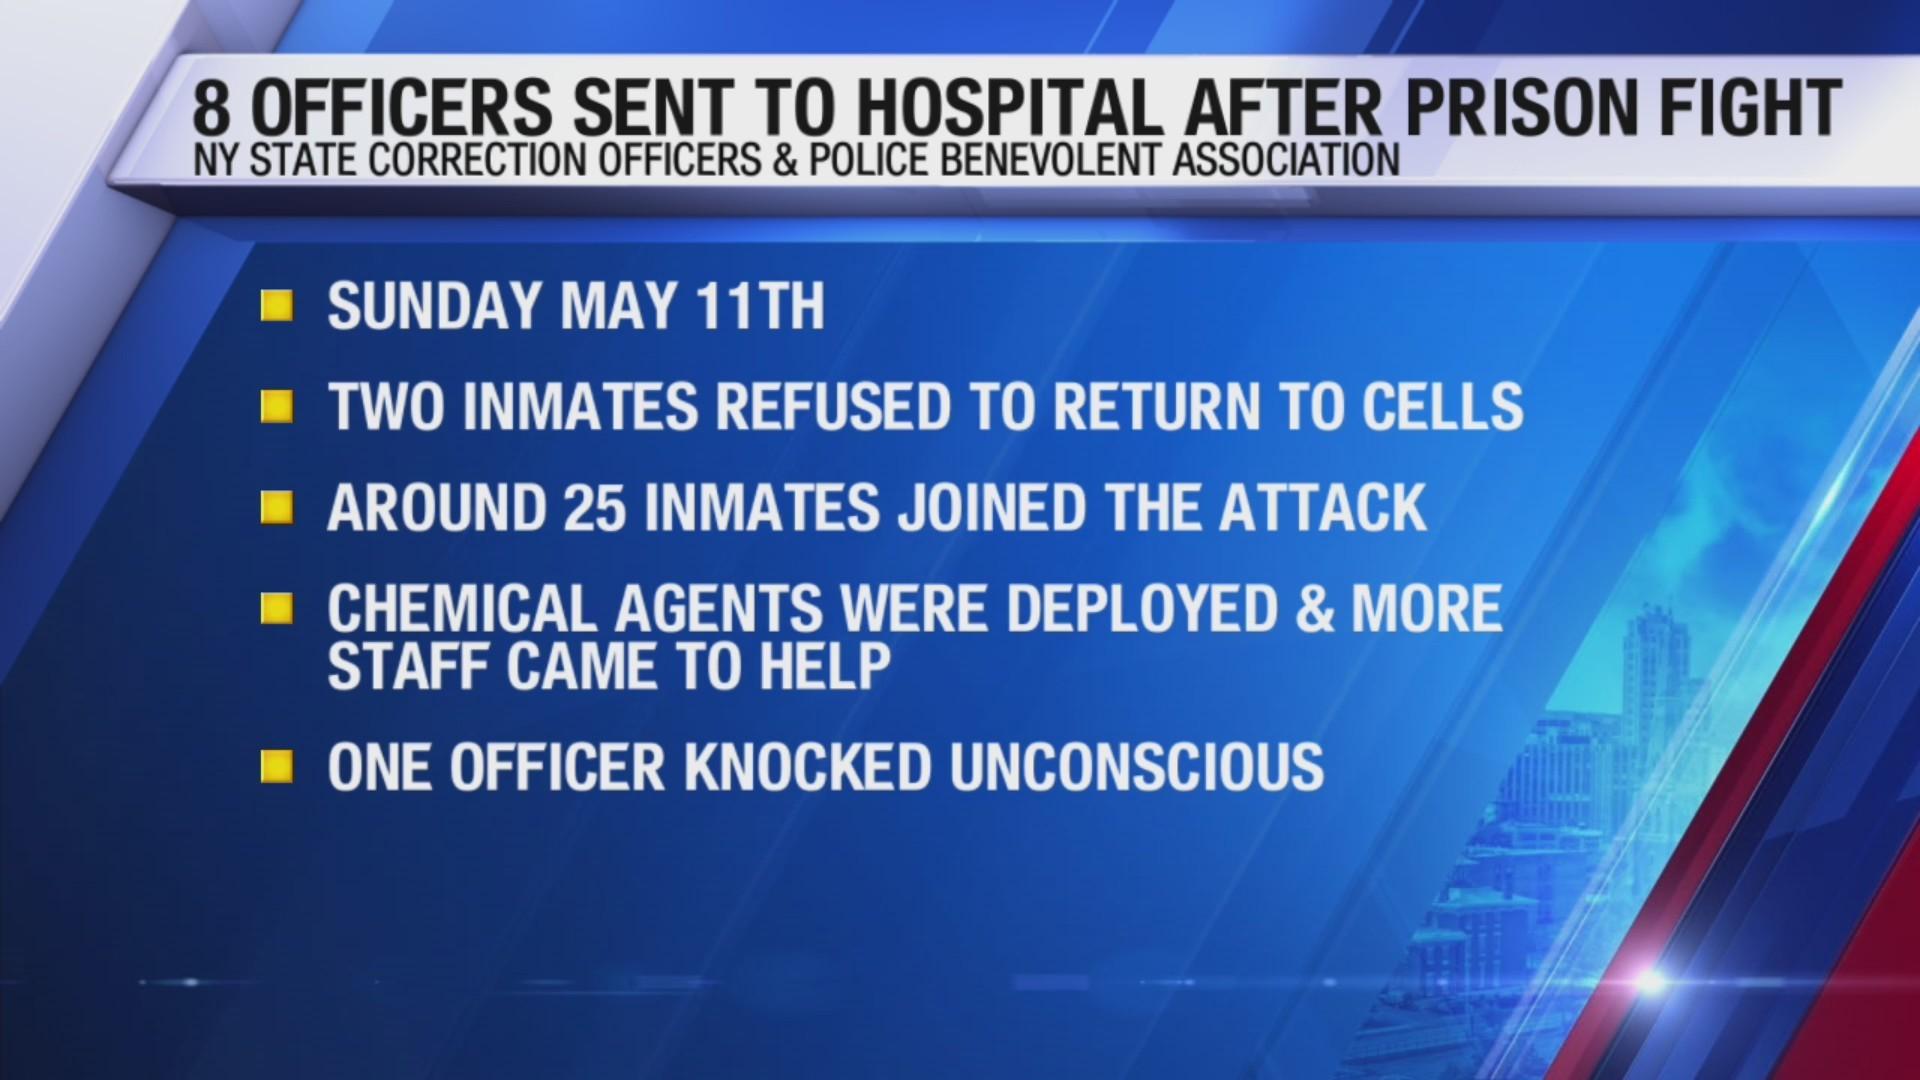 8_officers_sent_to_hospital_after_prison_0_20190521214604